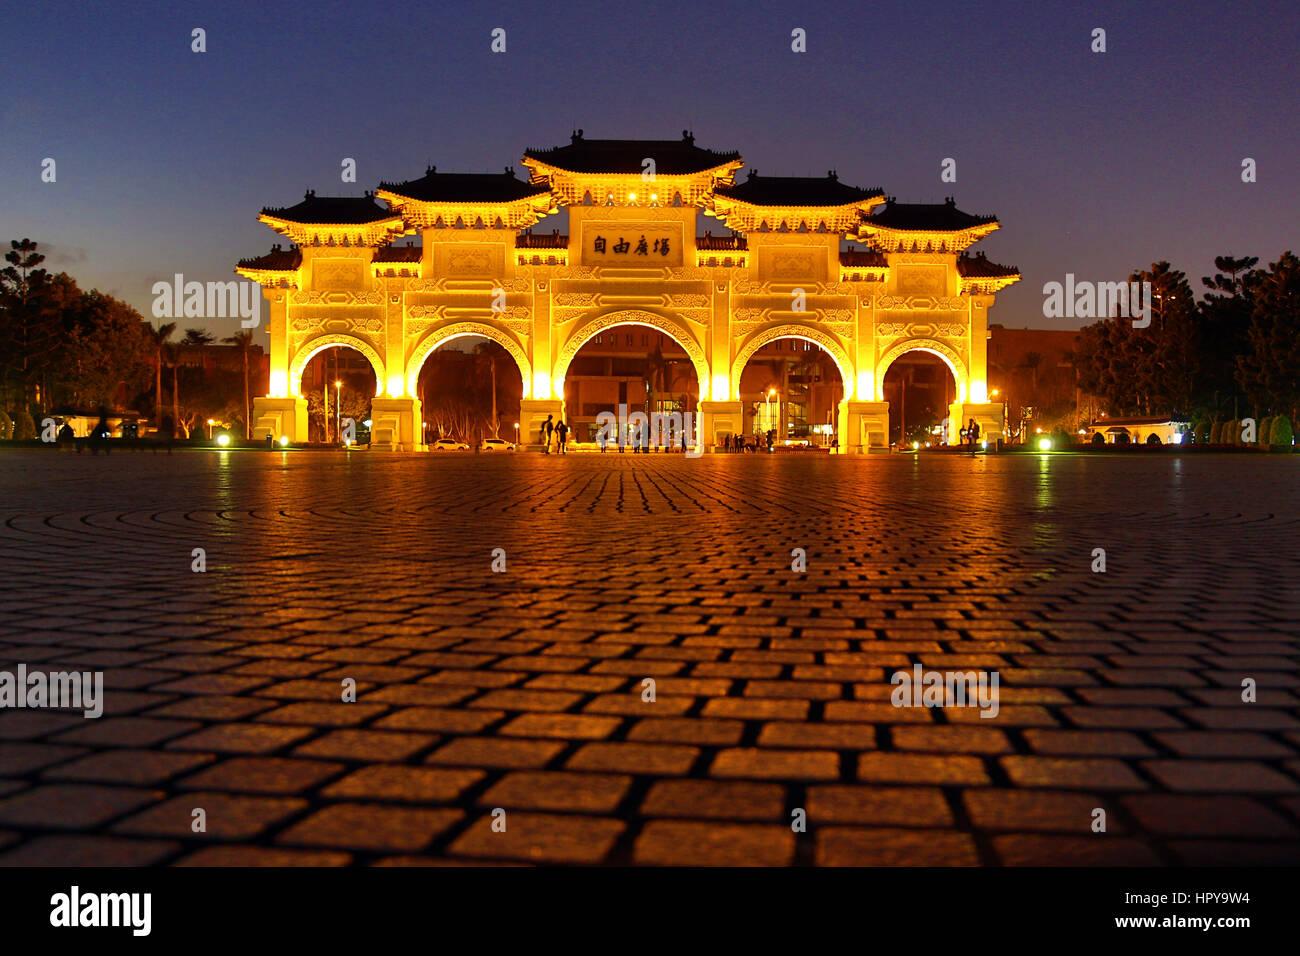 El National Chiang Kai Shek Memorial Hall principal puerta iluminada por la noche en Taipei, Taiwán. Imagen De Stock